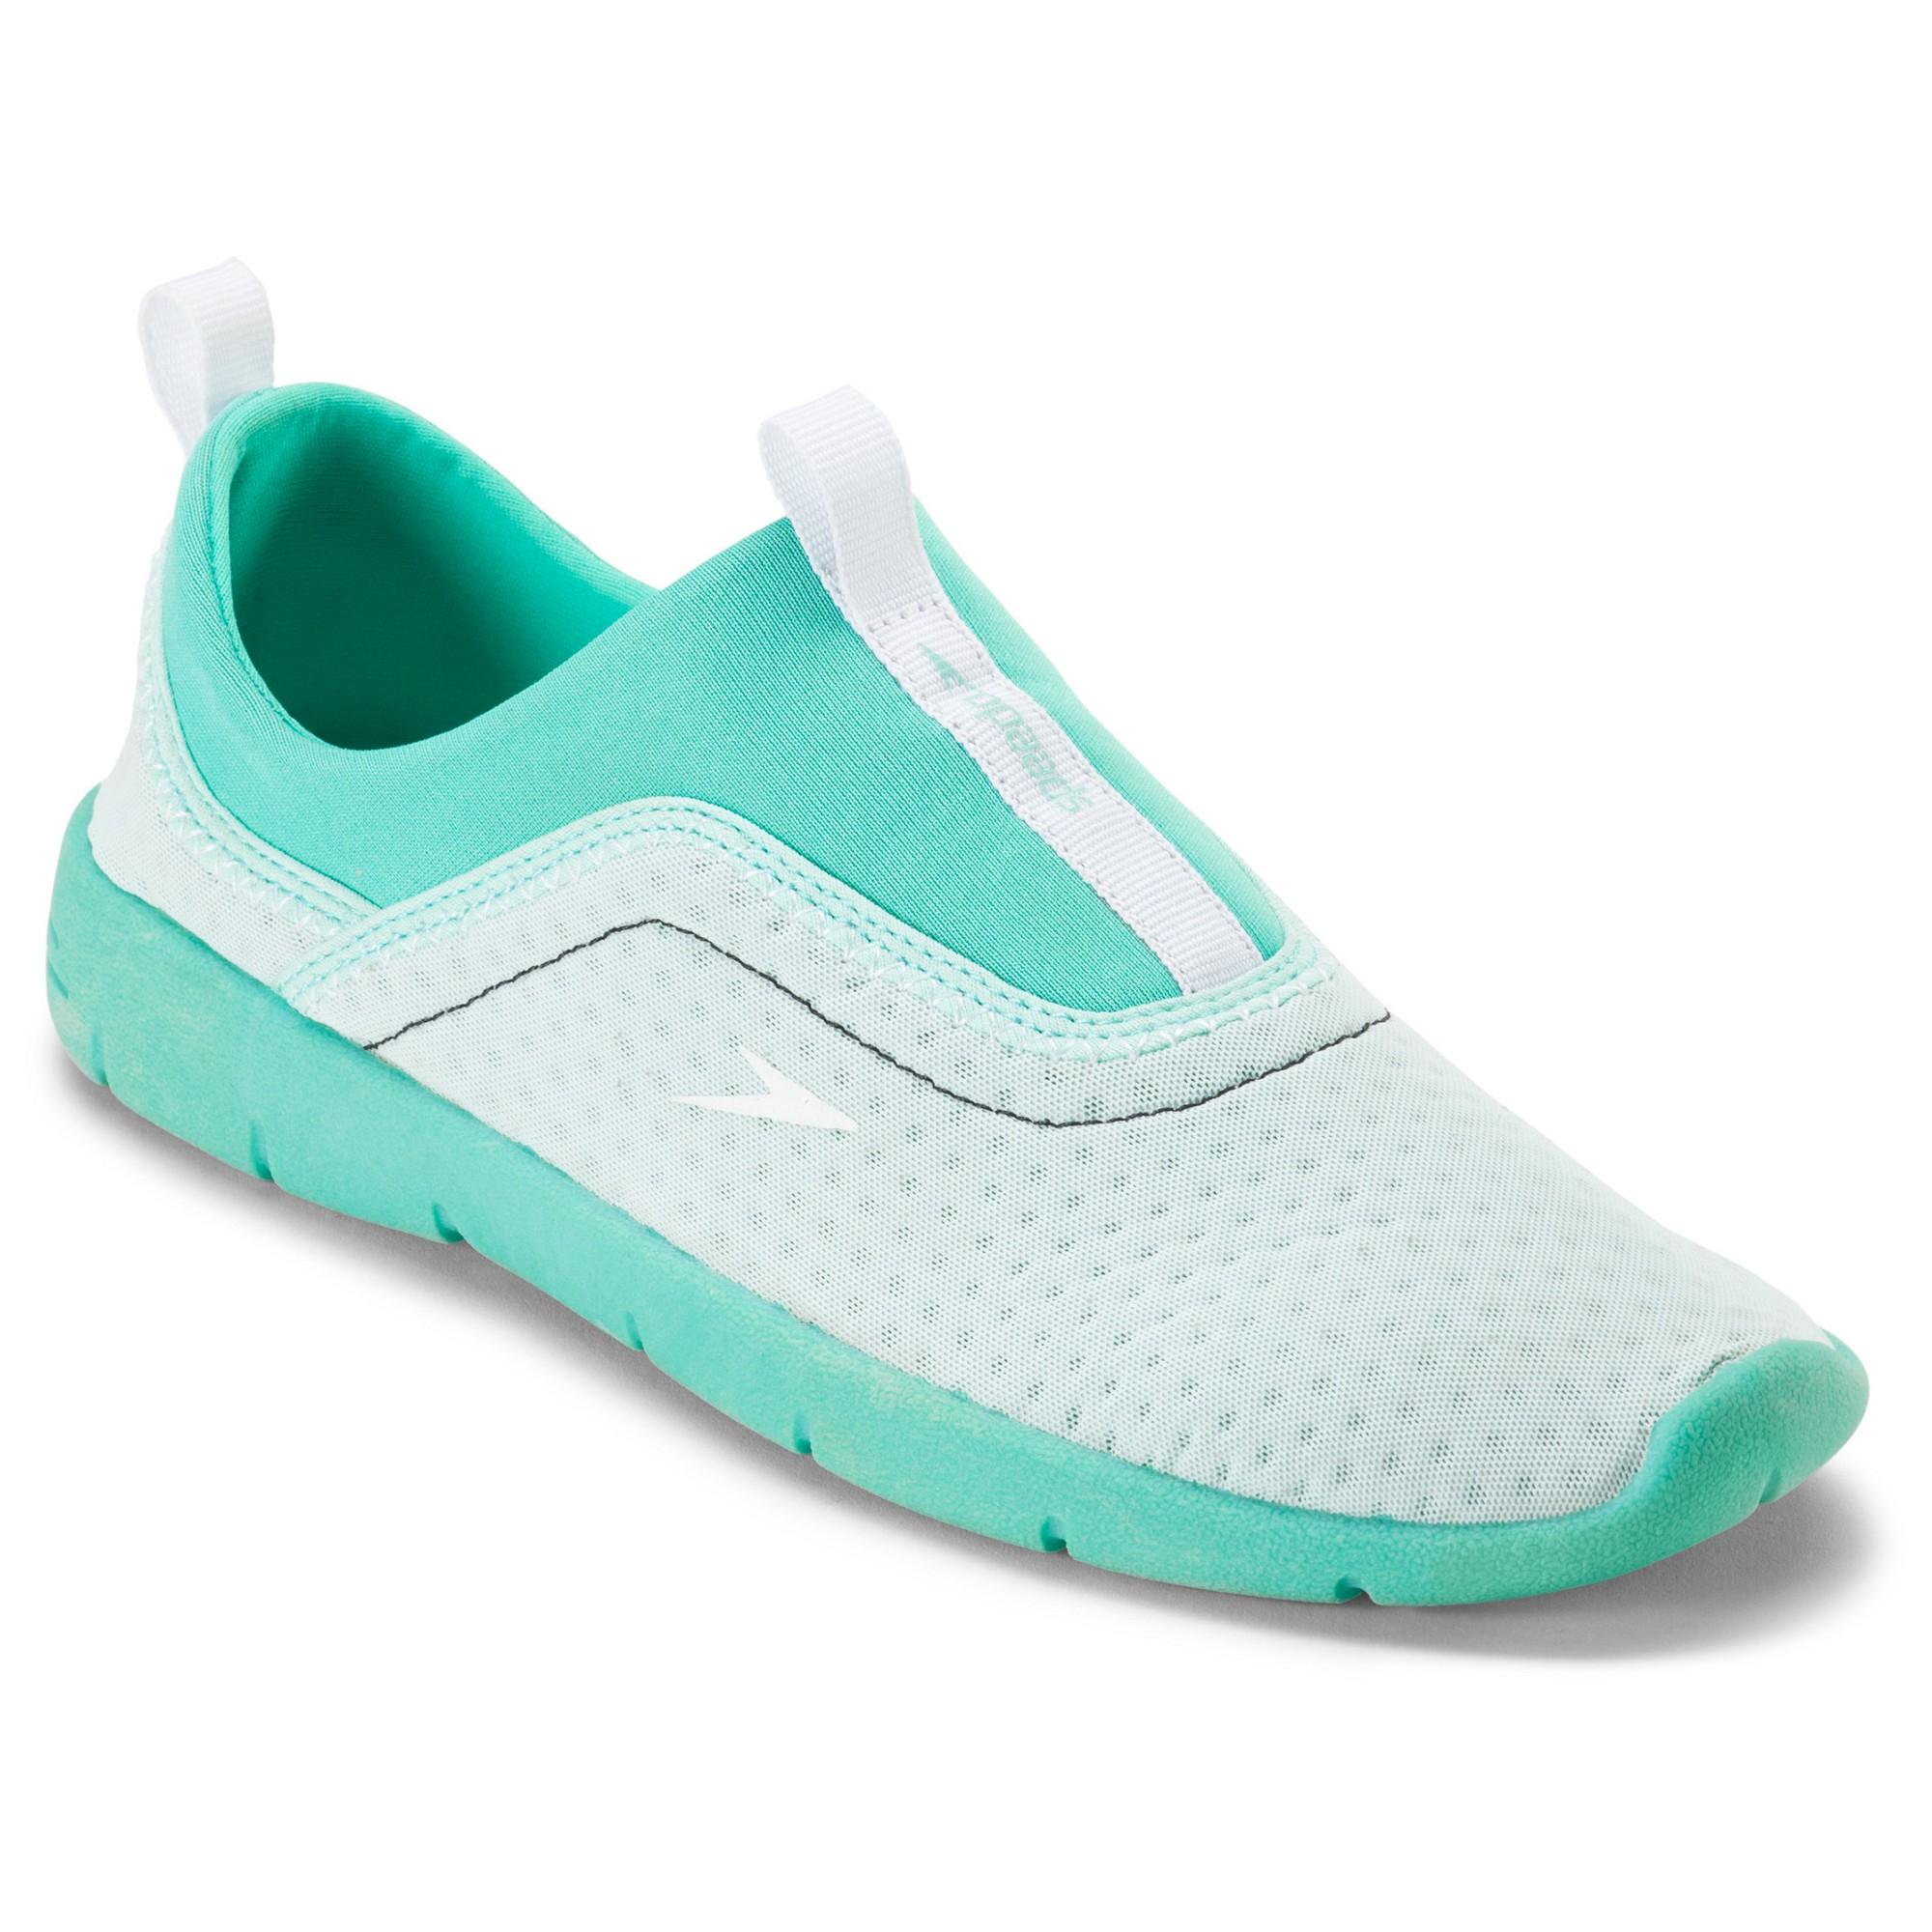 Speedo Adult Women's Aqua (Blue)skimmer Water Shoes Aqua